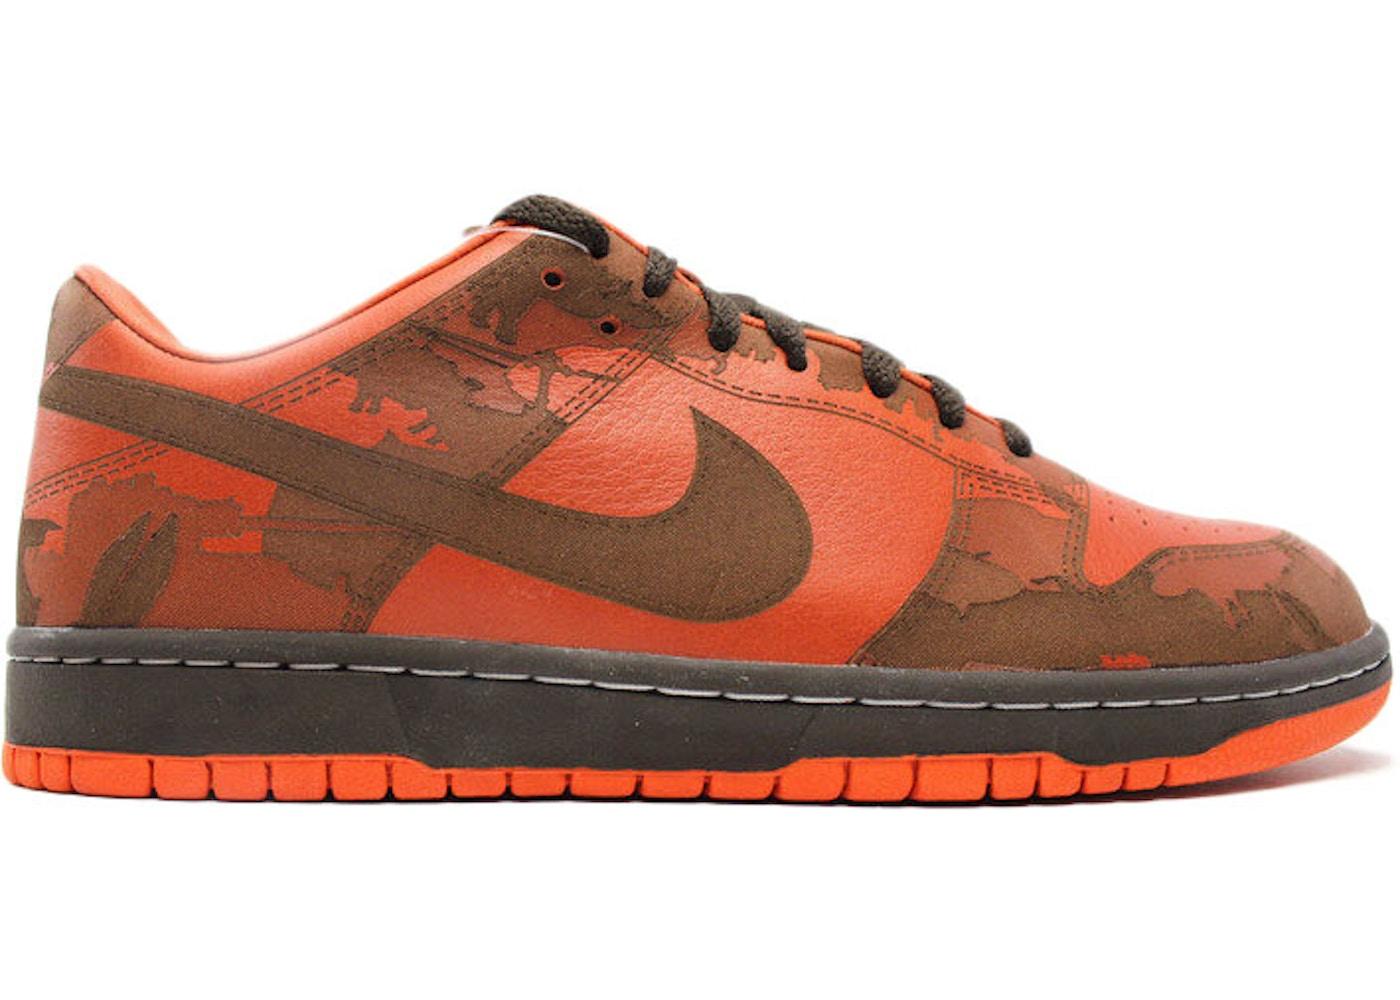 super popular dea61 66522 Buy Nike Basketball Dunk Shoes  Deadstock Sneakers